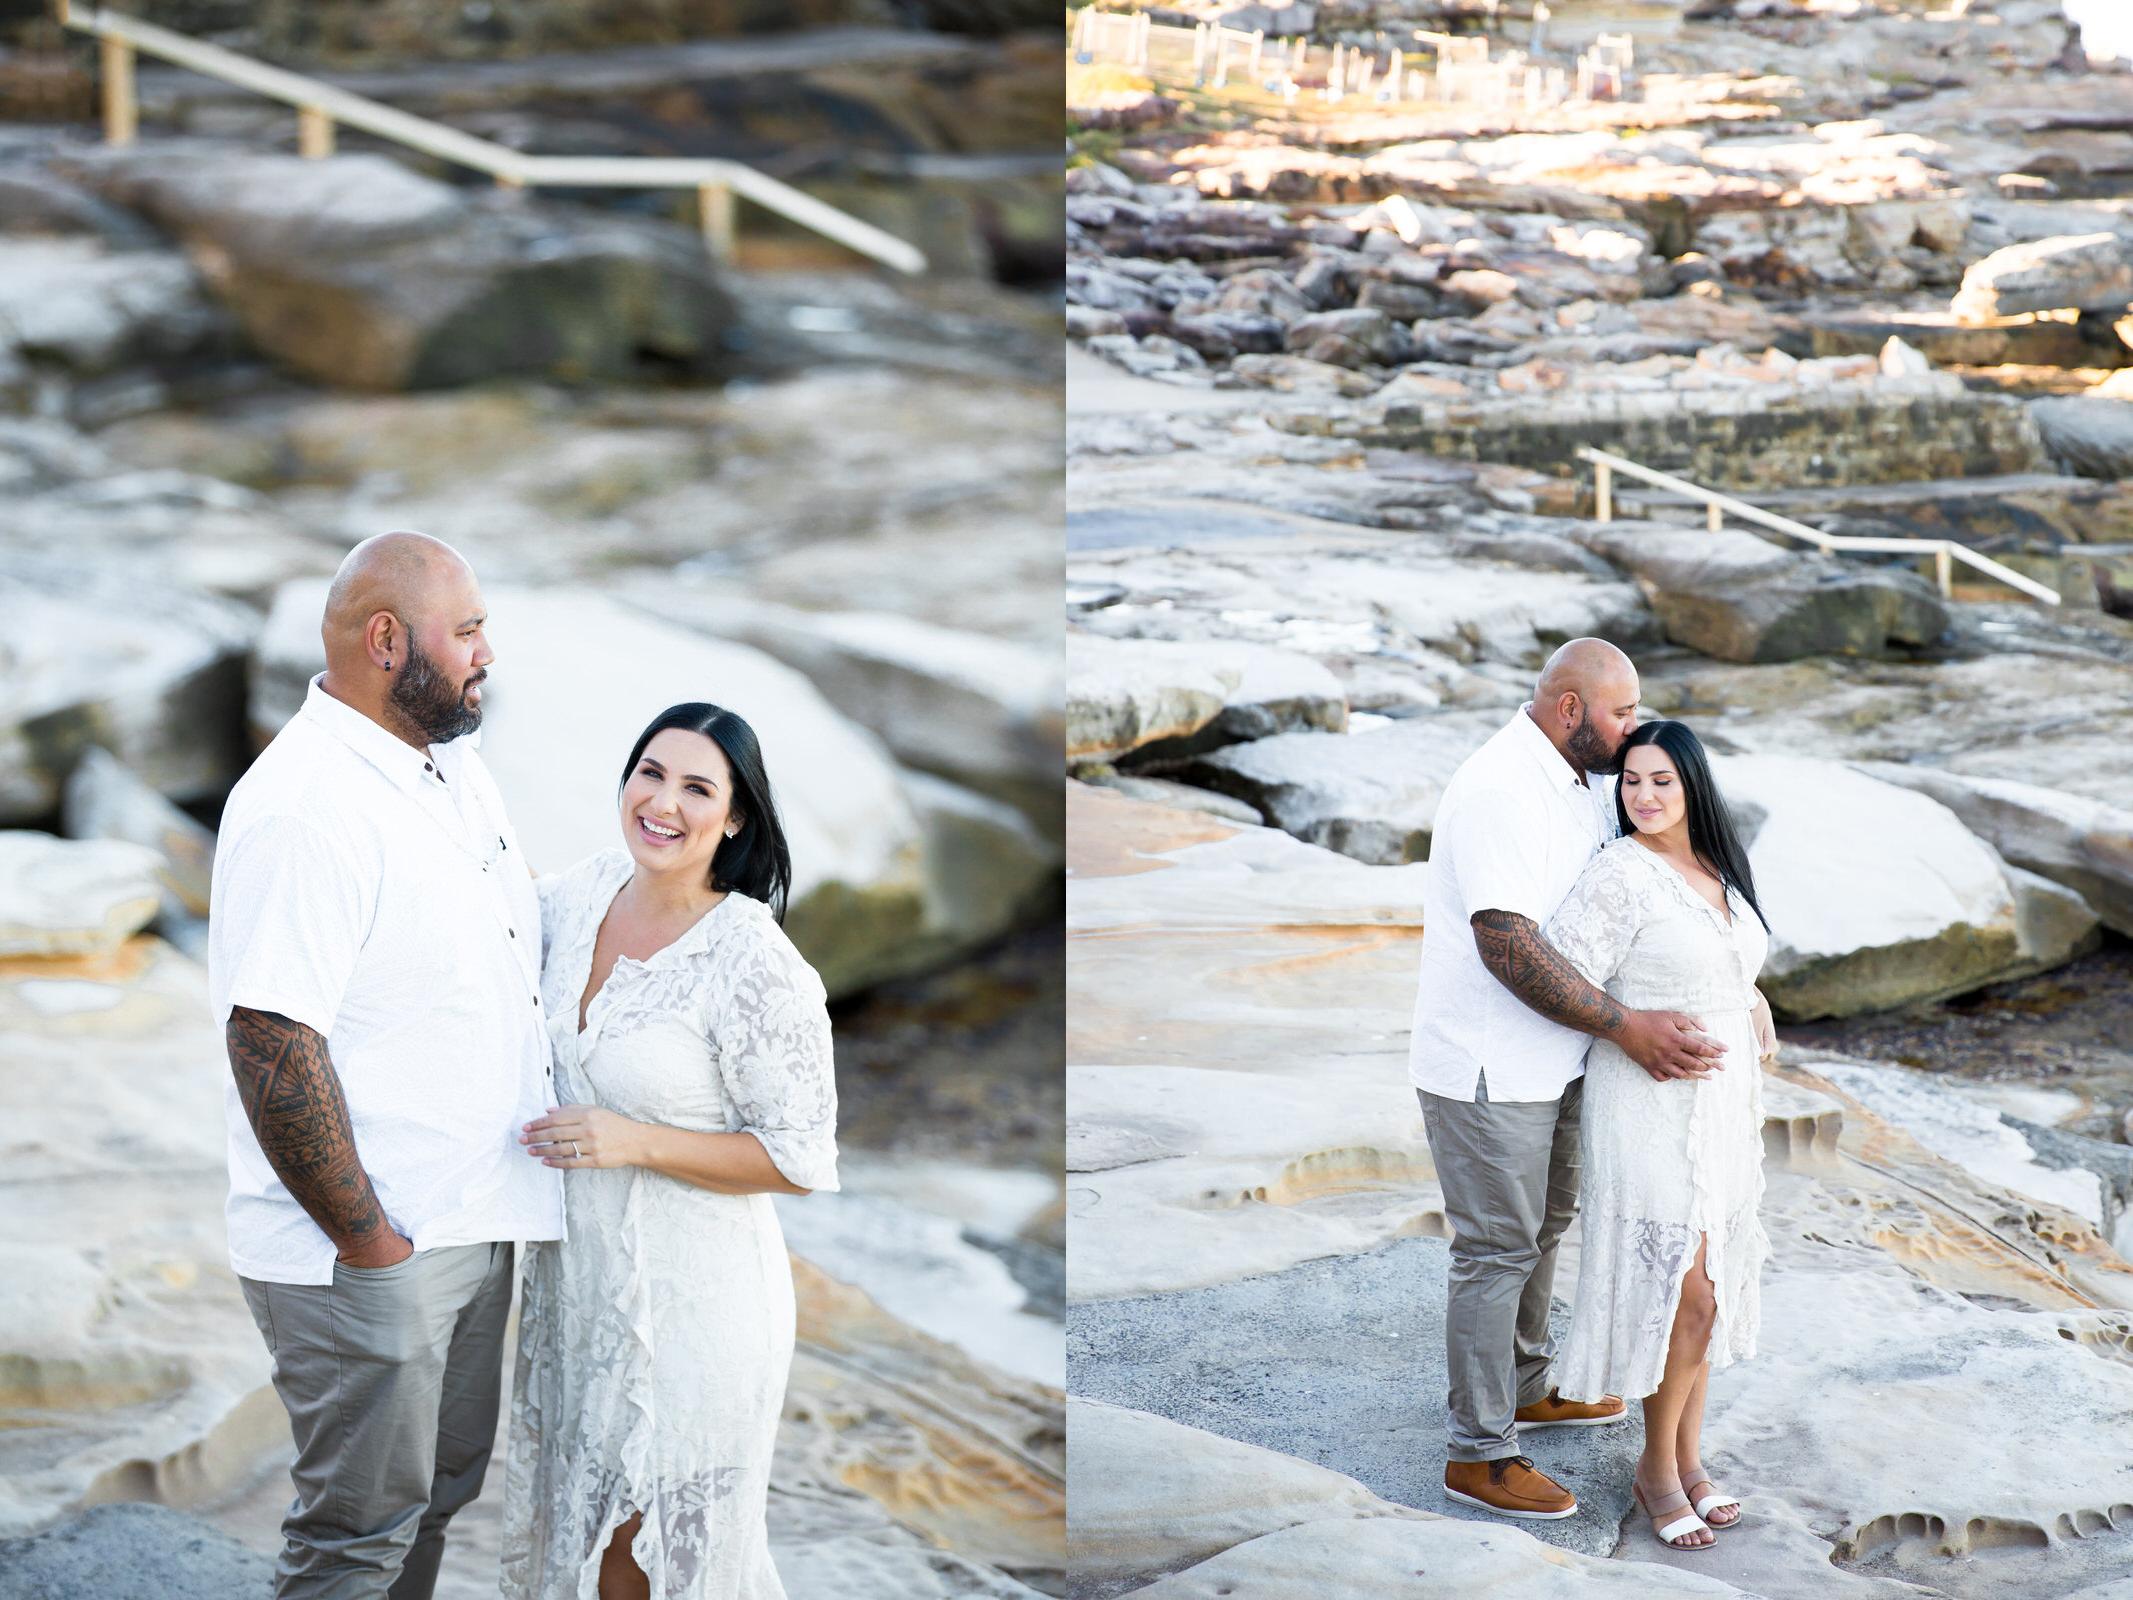 Sydney Wedding Photographer - Maroubra Beach - Jennifer Lam Photography (1).jpg